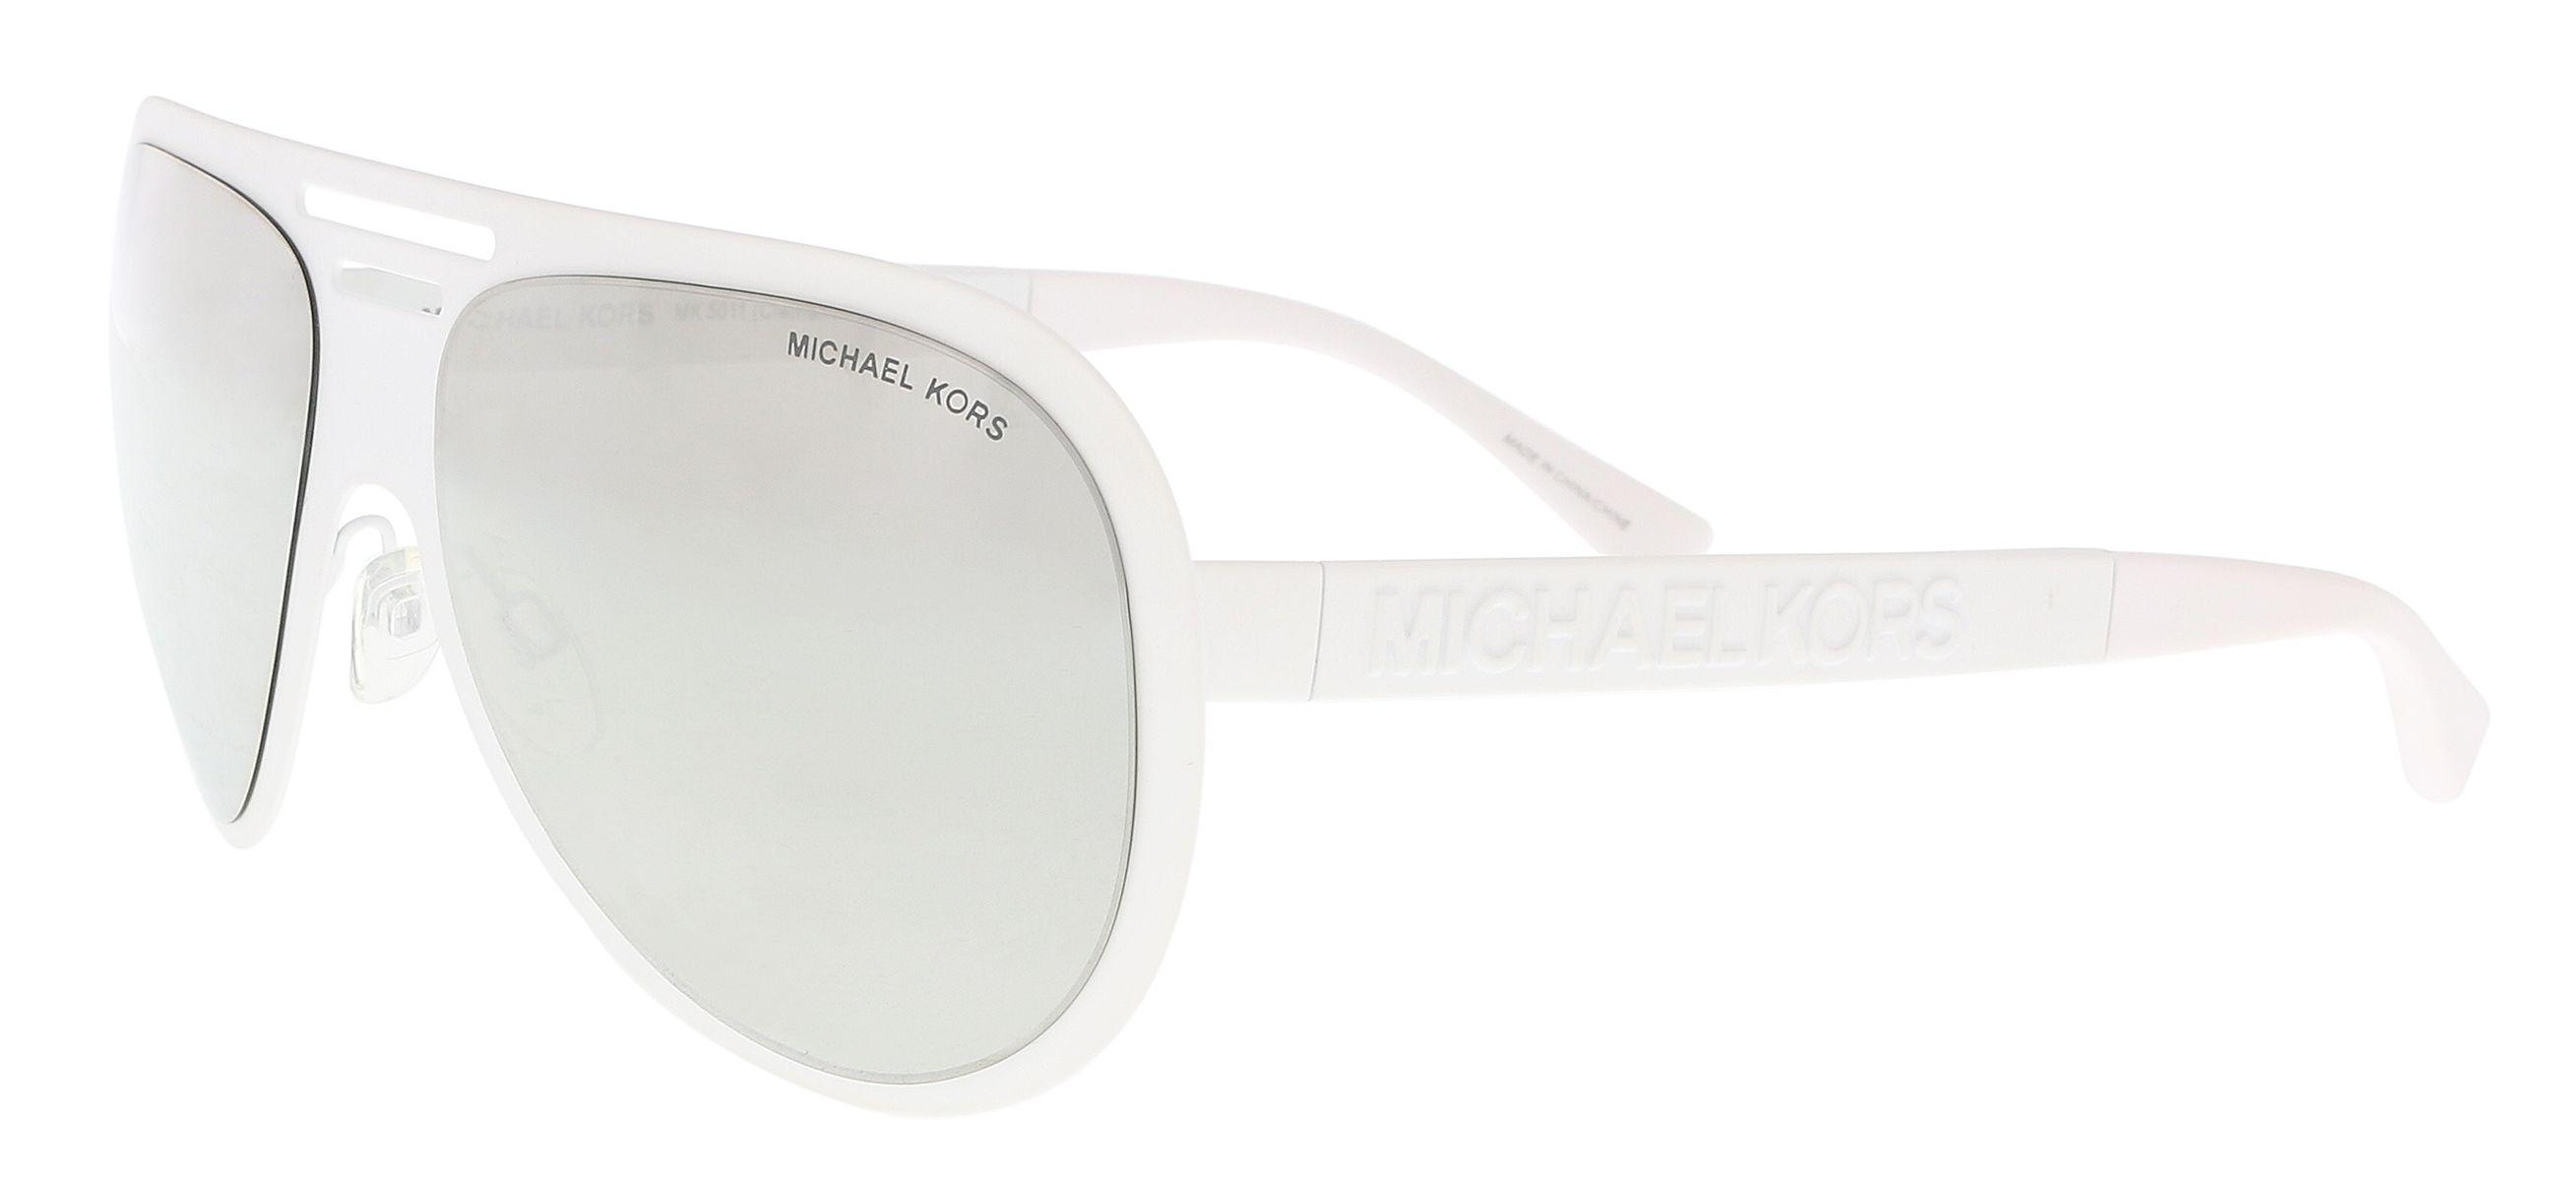 4b8359fb5f Michael Kors - Mk5011 11236g White Aviator Sunglasses - Lyst. View  fullscreen